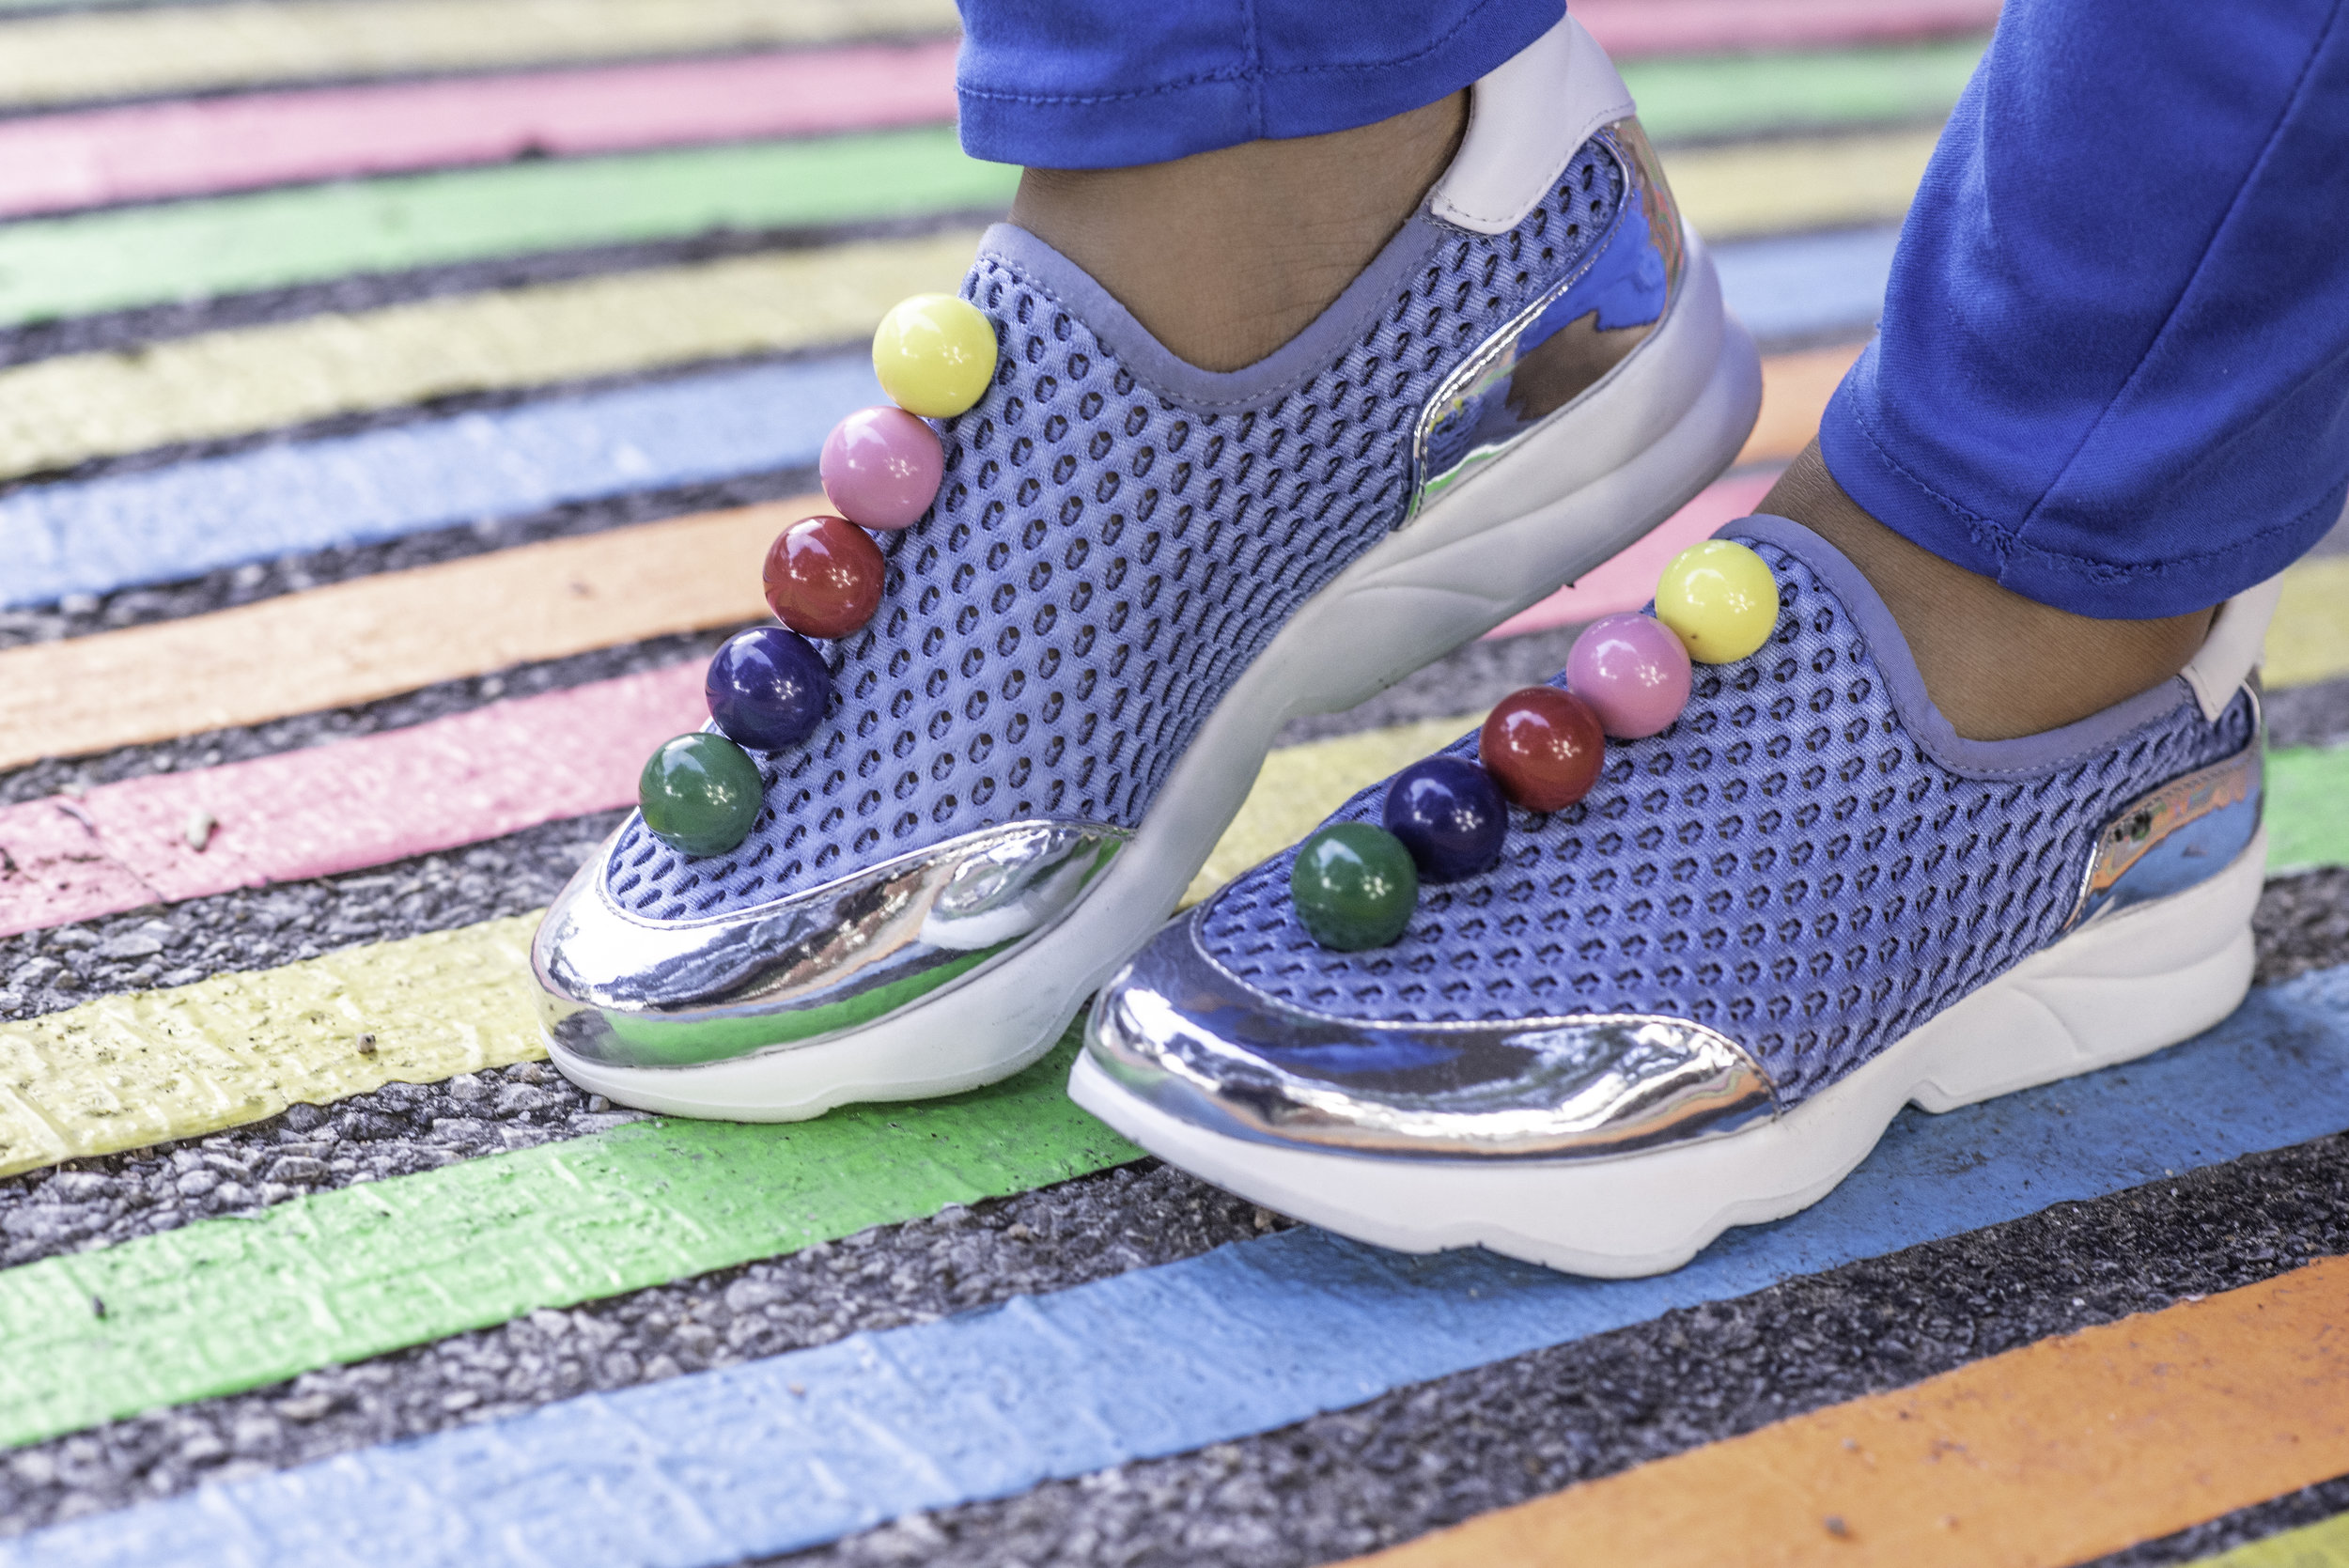 Katy Perry Gum ball Shoes.jpg